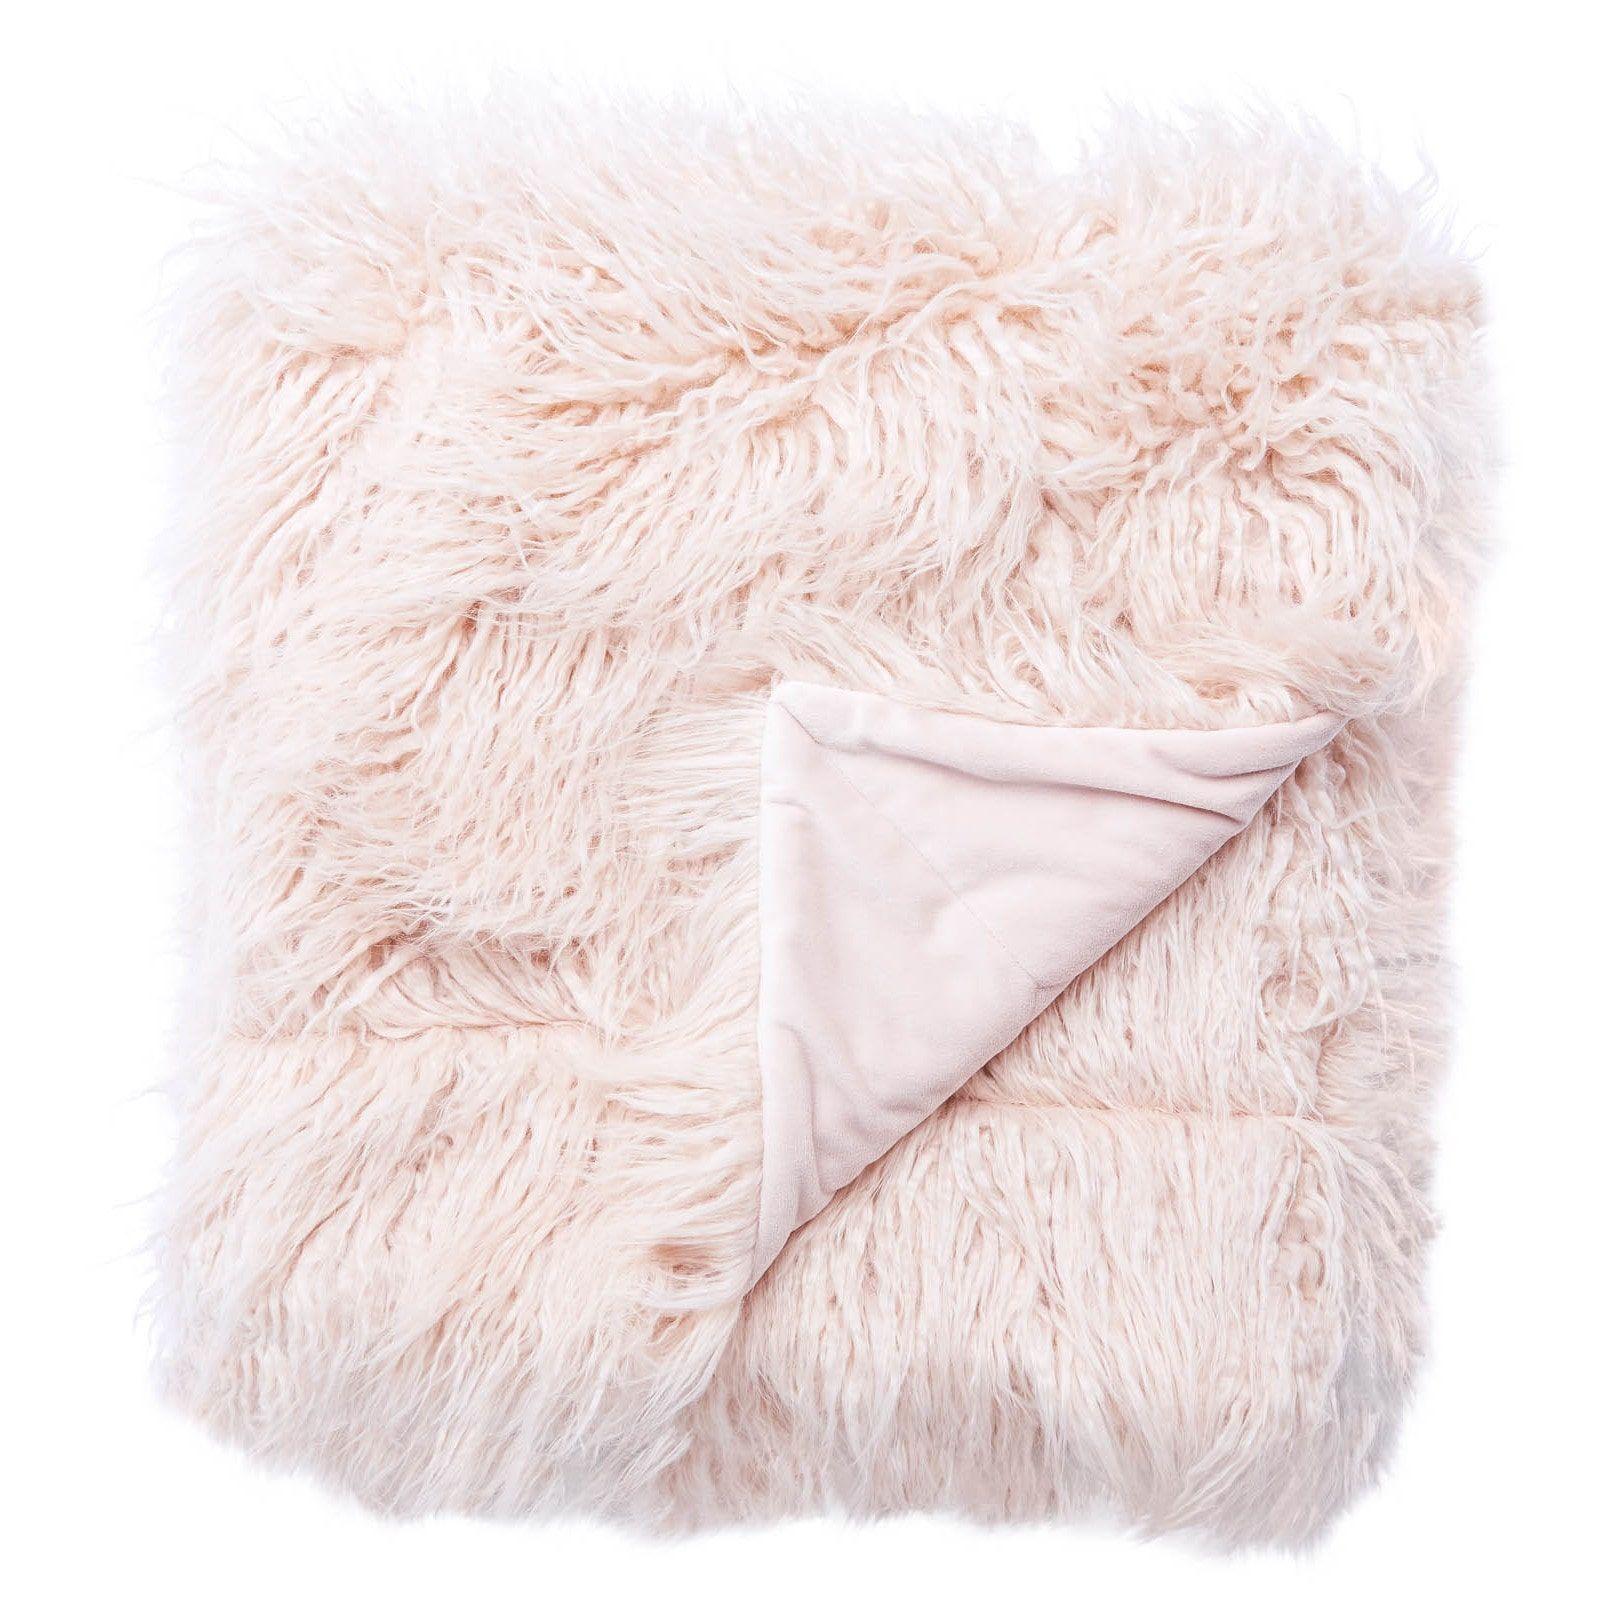 Blush Pink Throw Blanket Jaipur Allura Faux Fur Throw  Products  Pinterest  Pink Throws